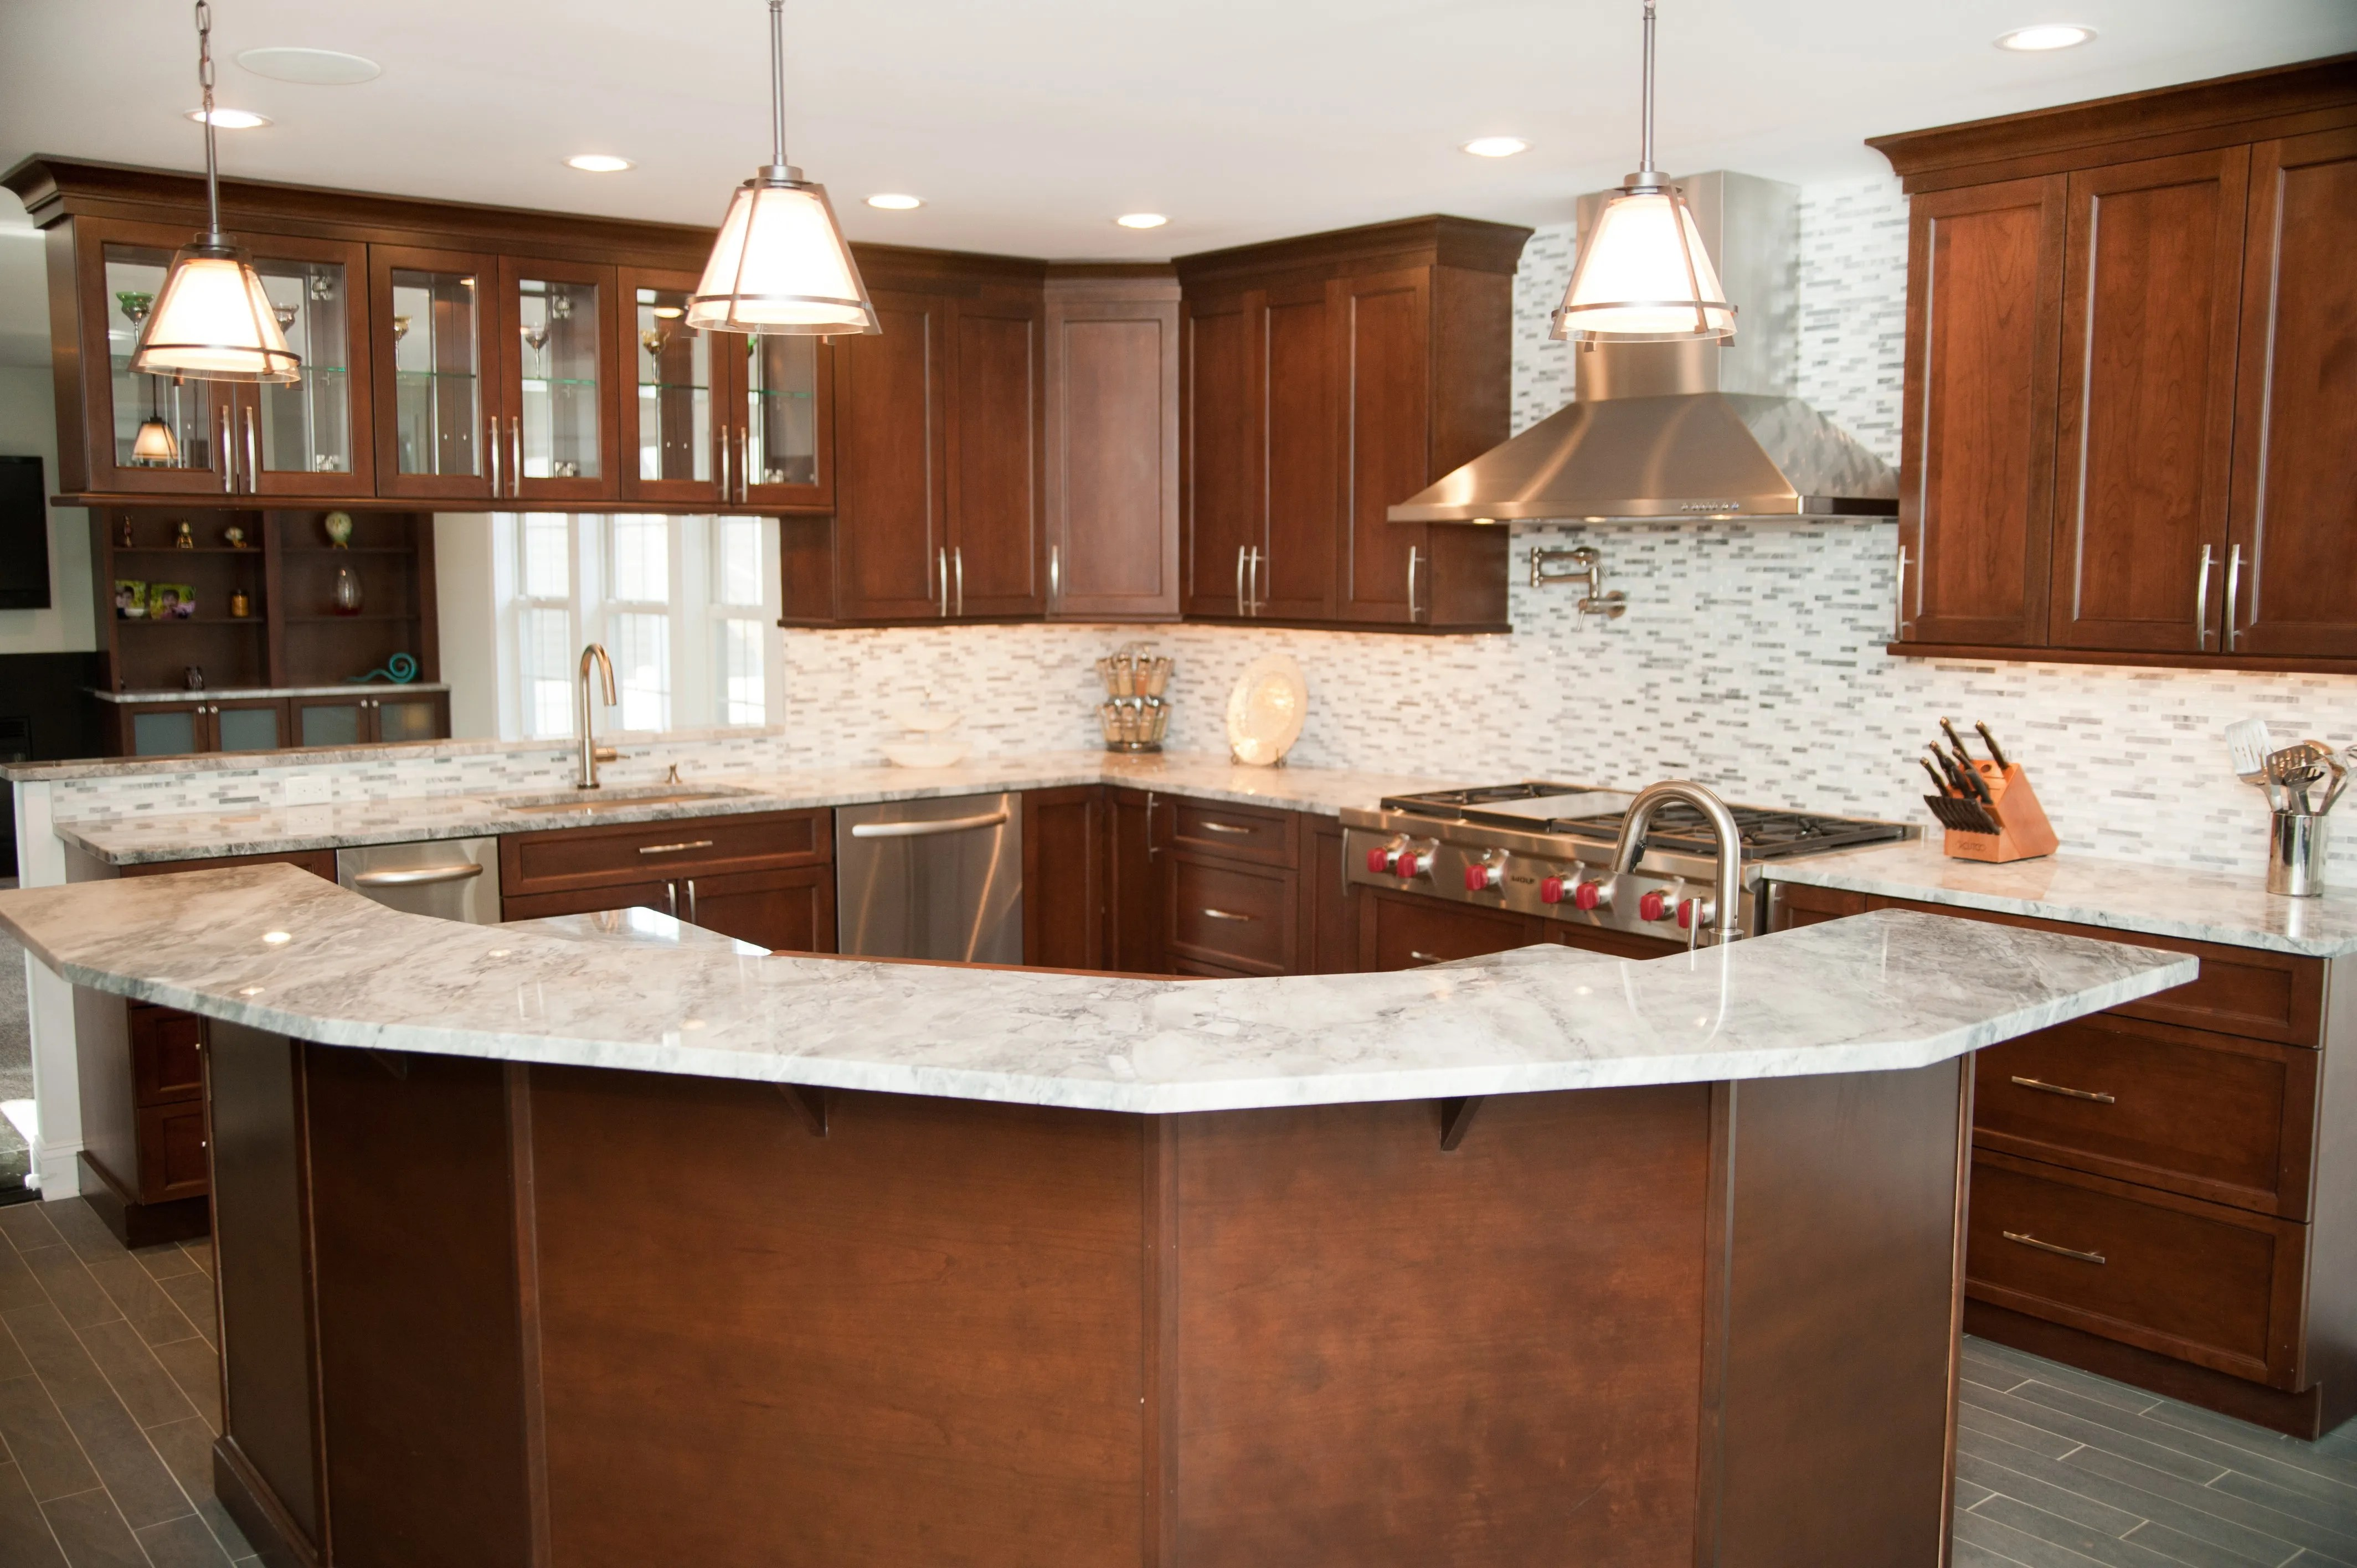 alternative kitchen backsplash material options - design build planners